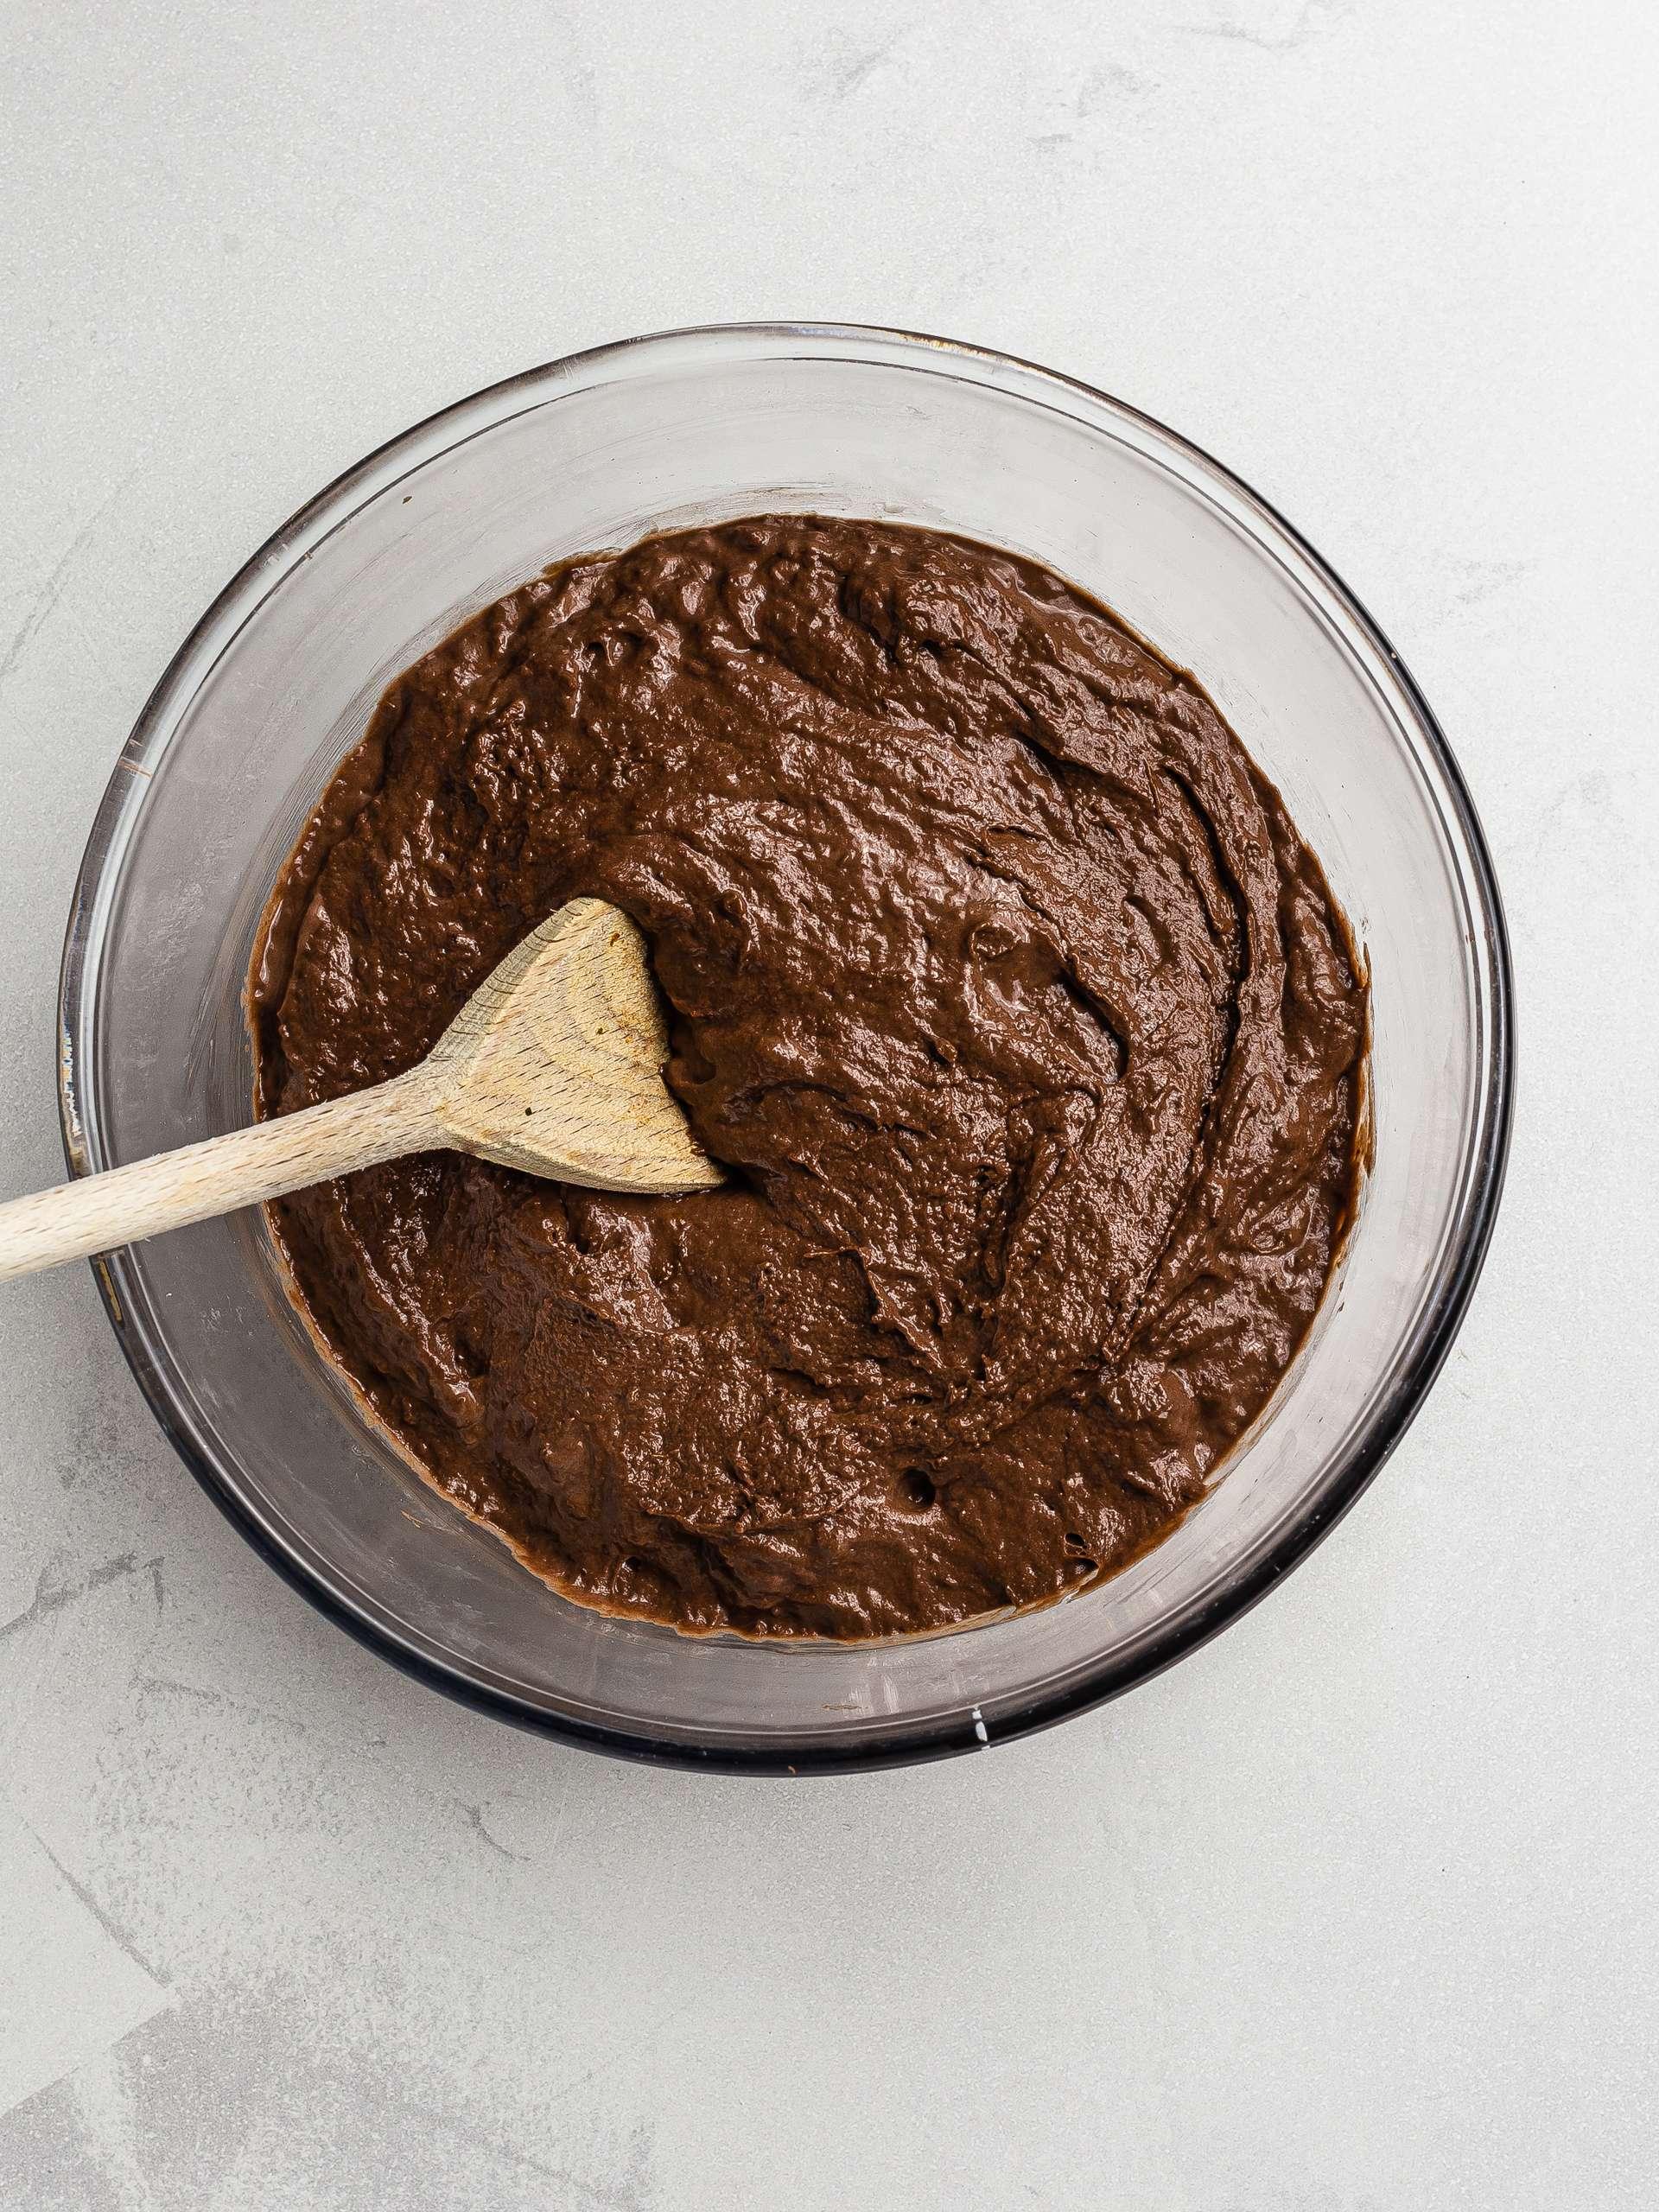 vegan chocolate cake batter in a bowl